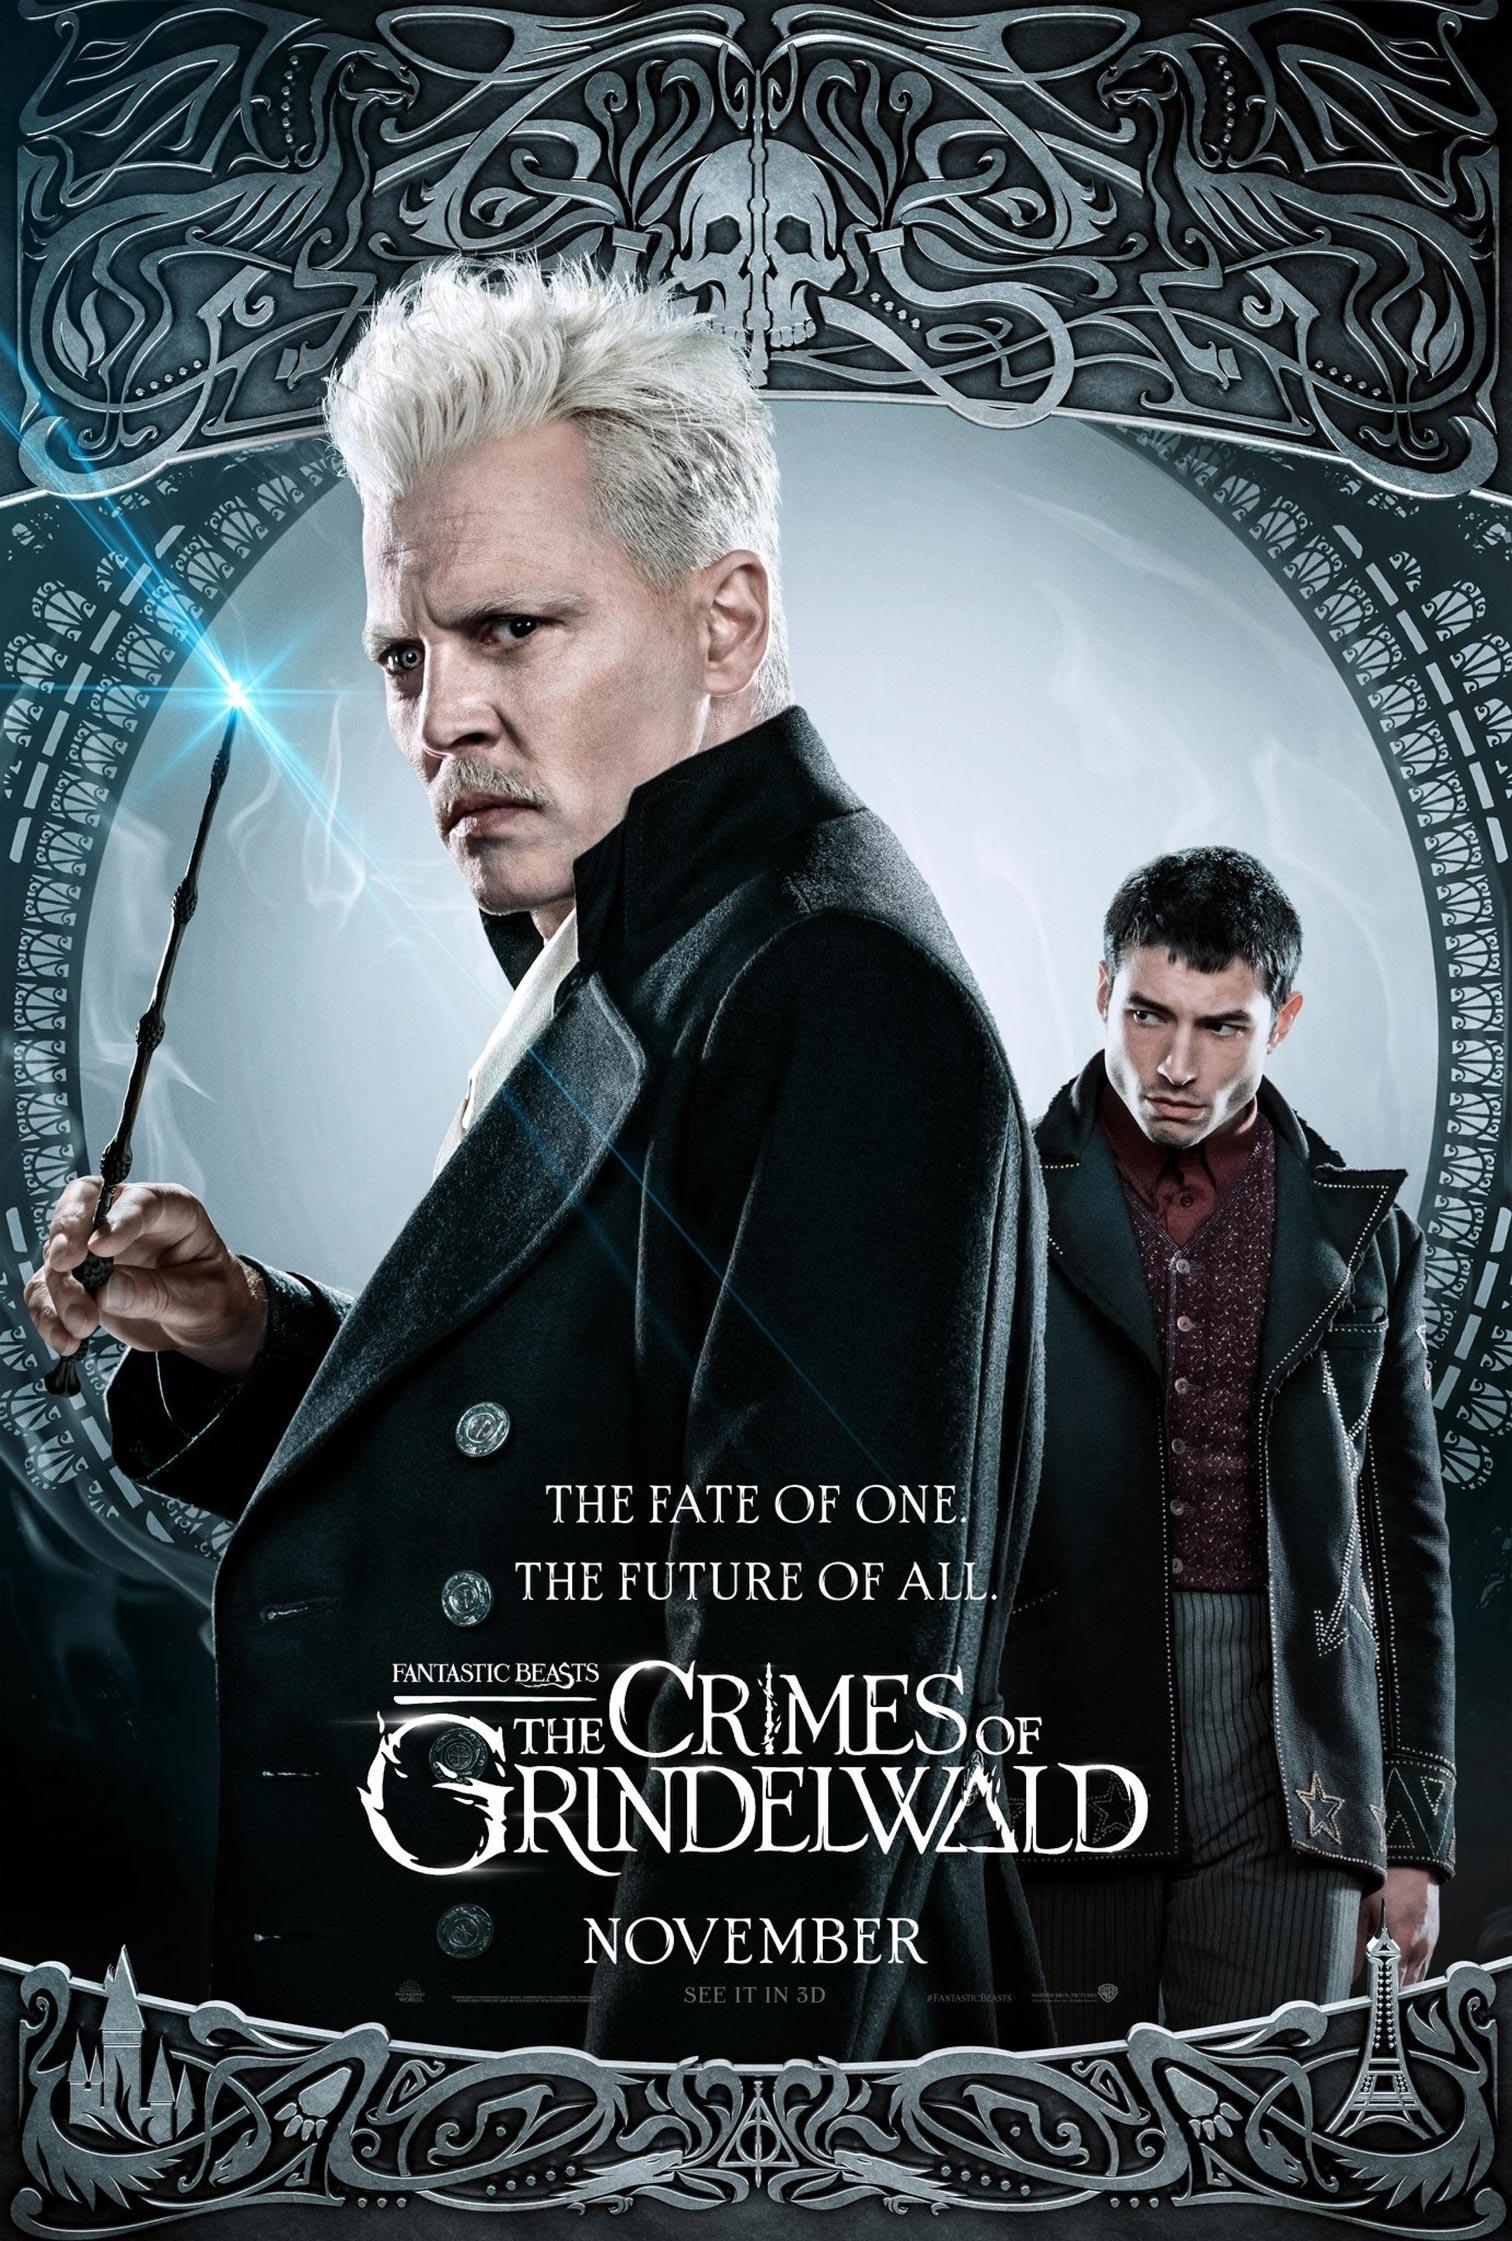 Fantastic Beasts: The Crimes of Grindelwald Poster #17